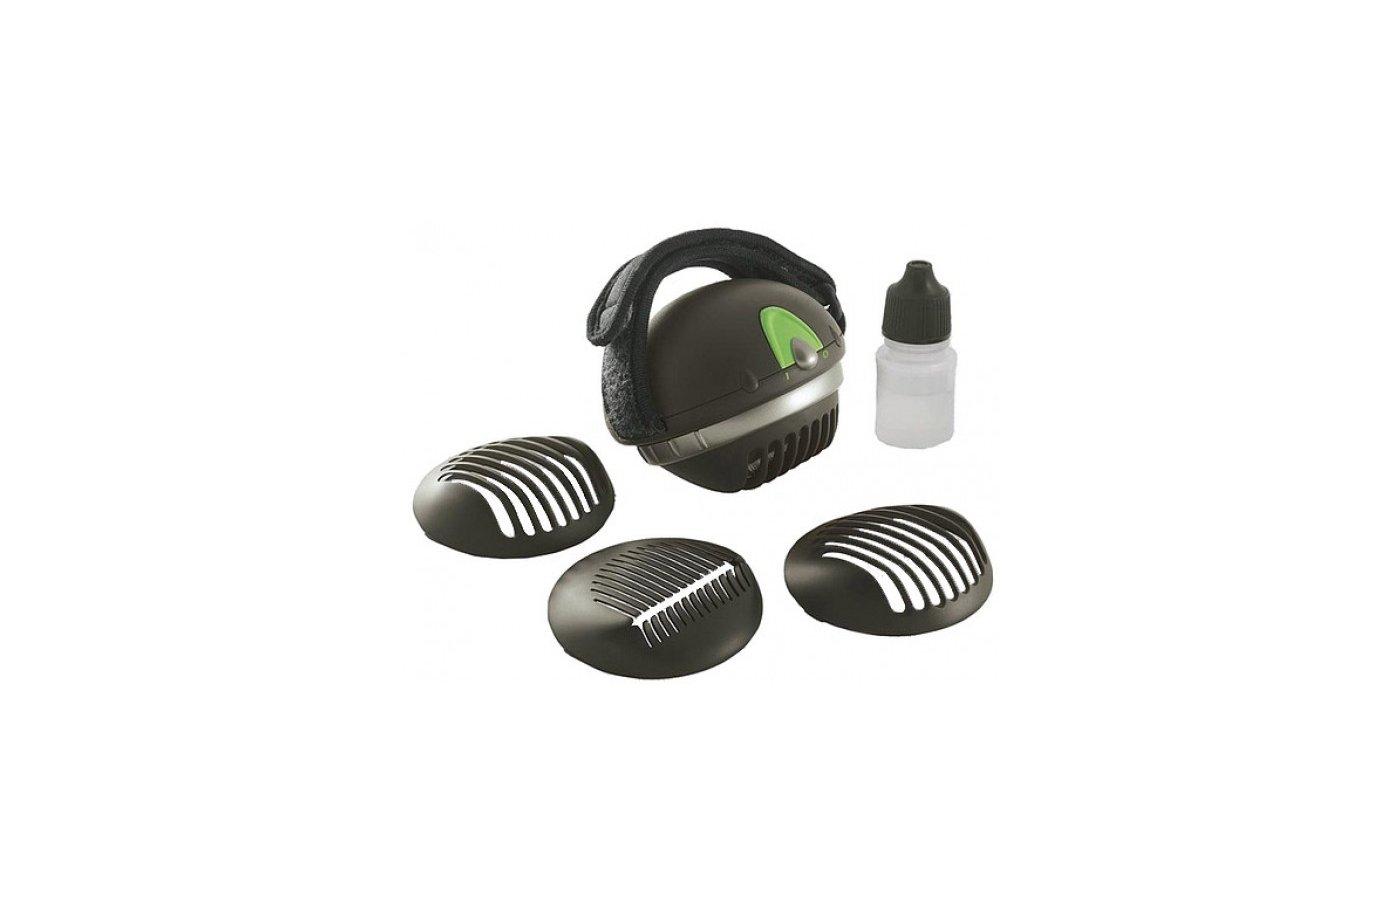 Машинка для стрижки волос Vidal Sassoon VSCL 118